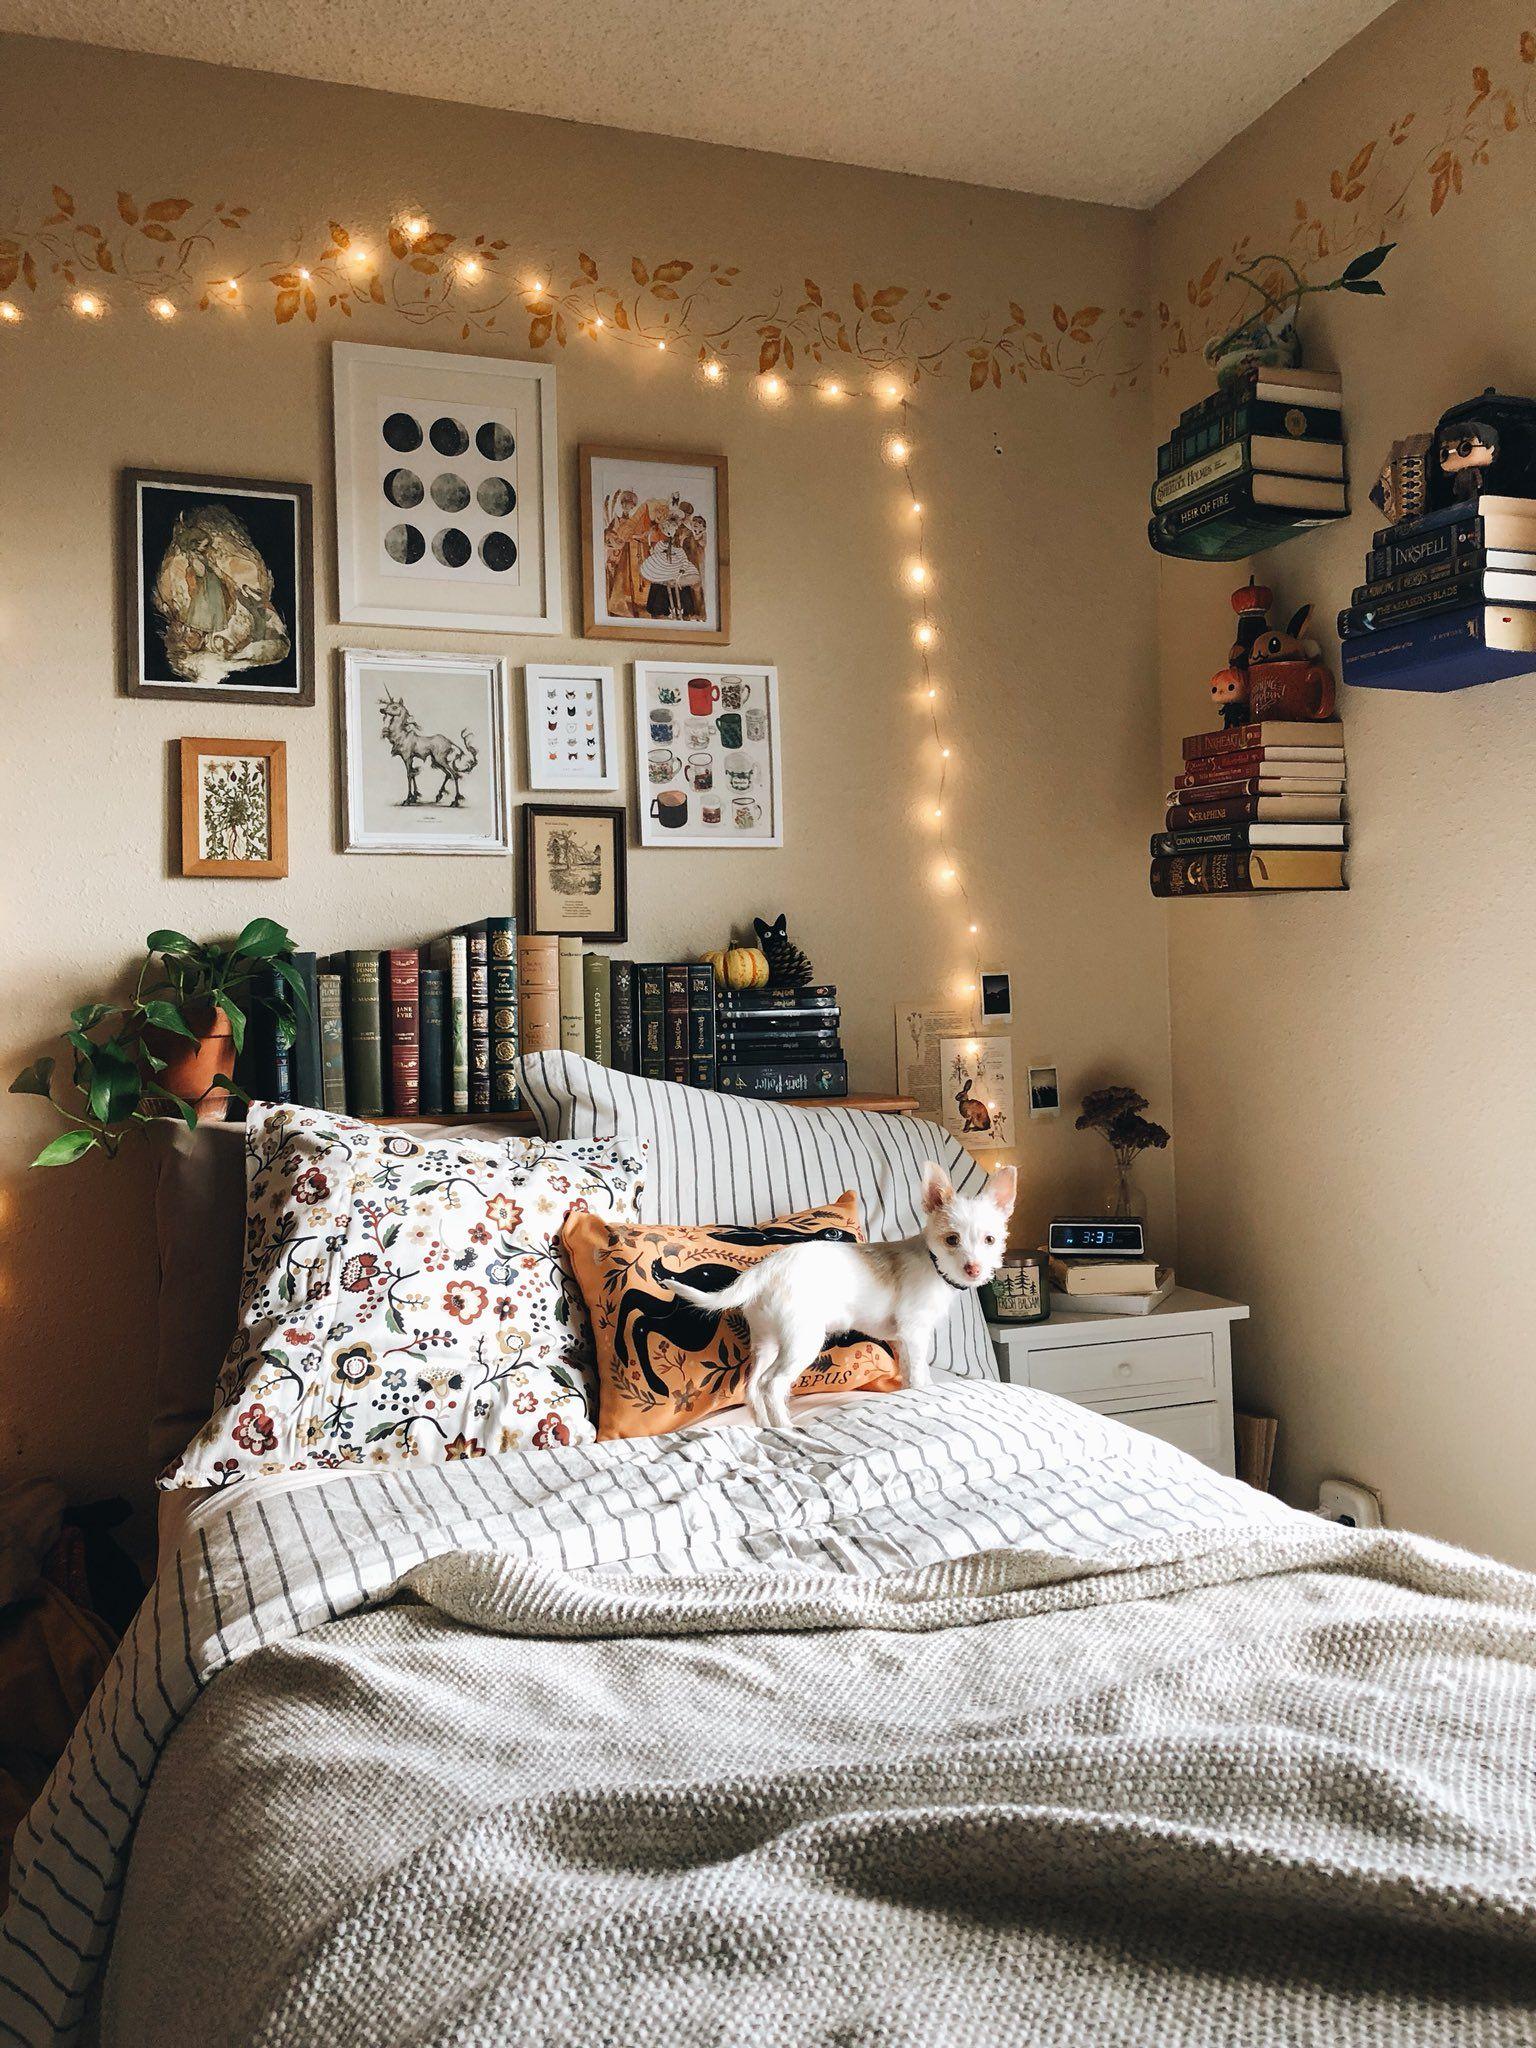 Aesthetic Dorm Room: Bedroom Design, Aesthetic